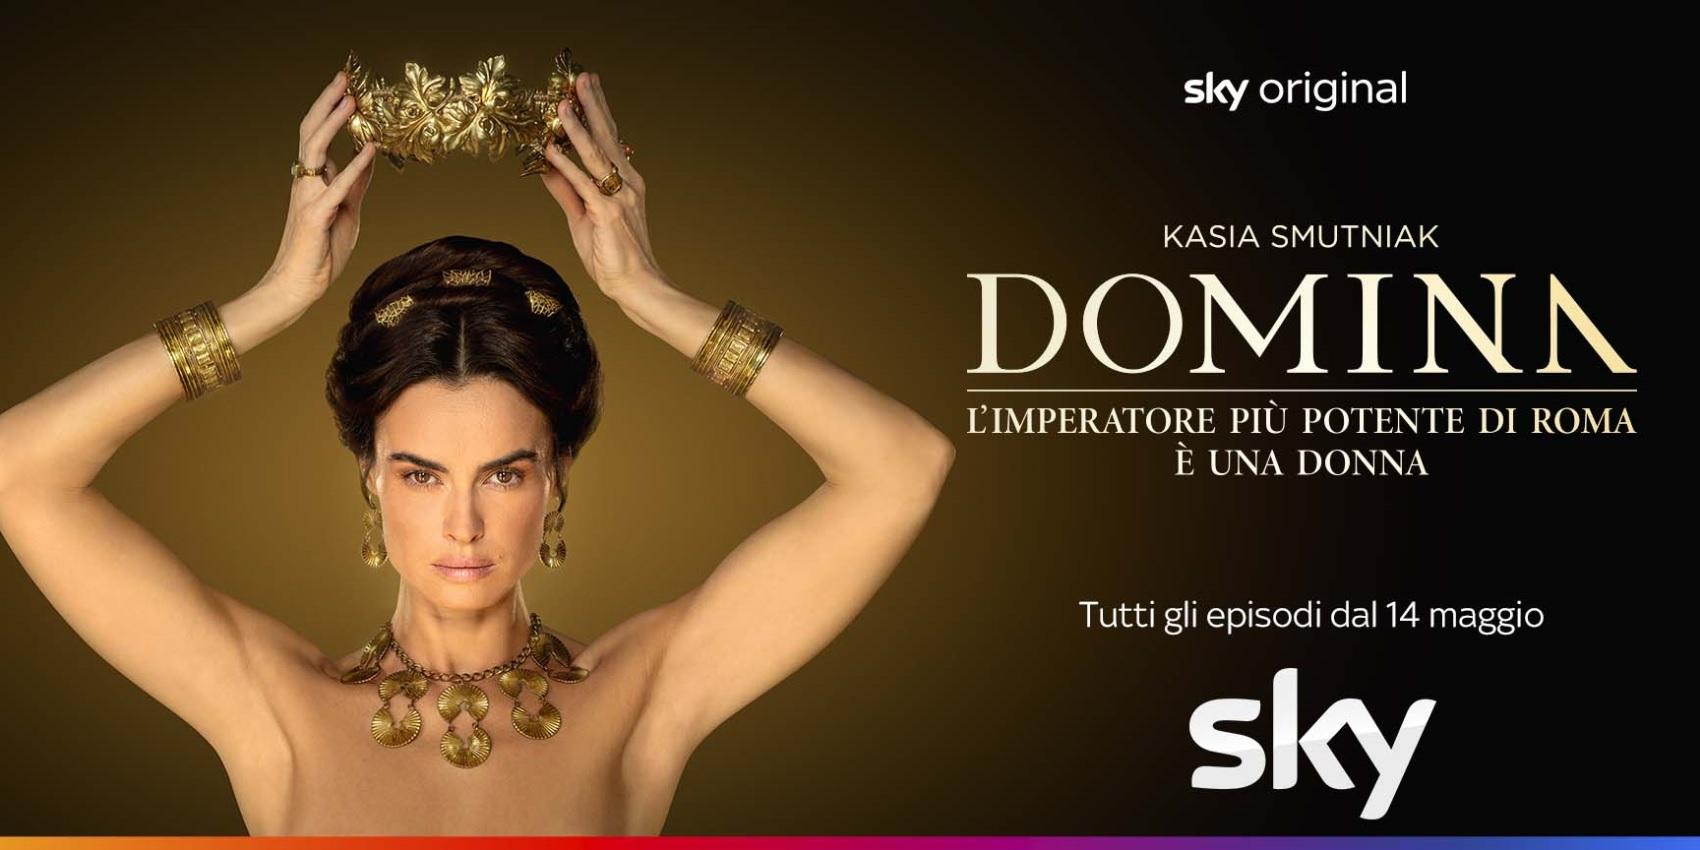 Serie tv Domina trama e cast, Kasia Smutniak è Livia Drusilla, moglie di Gaio Ottaviano